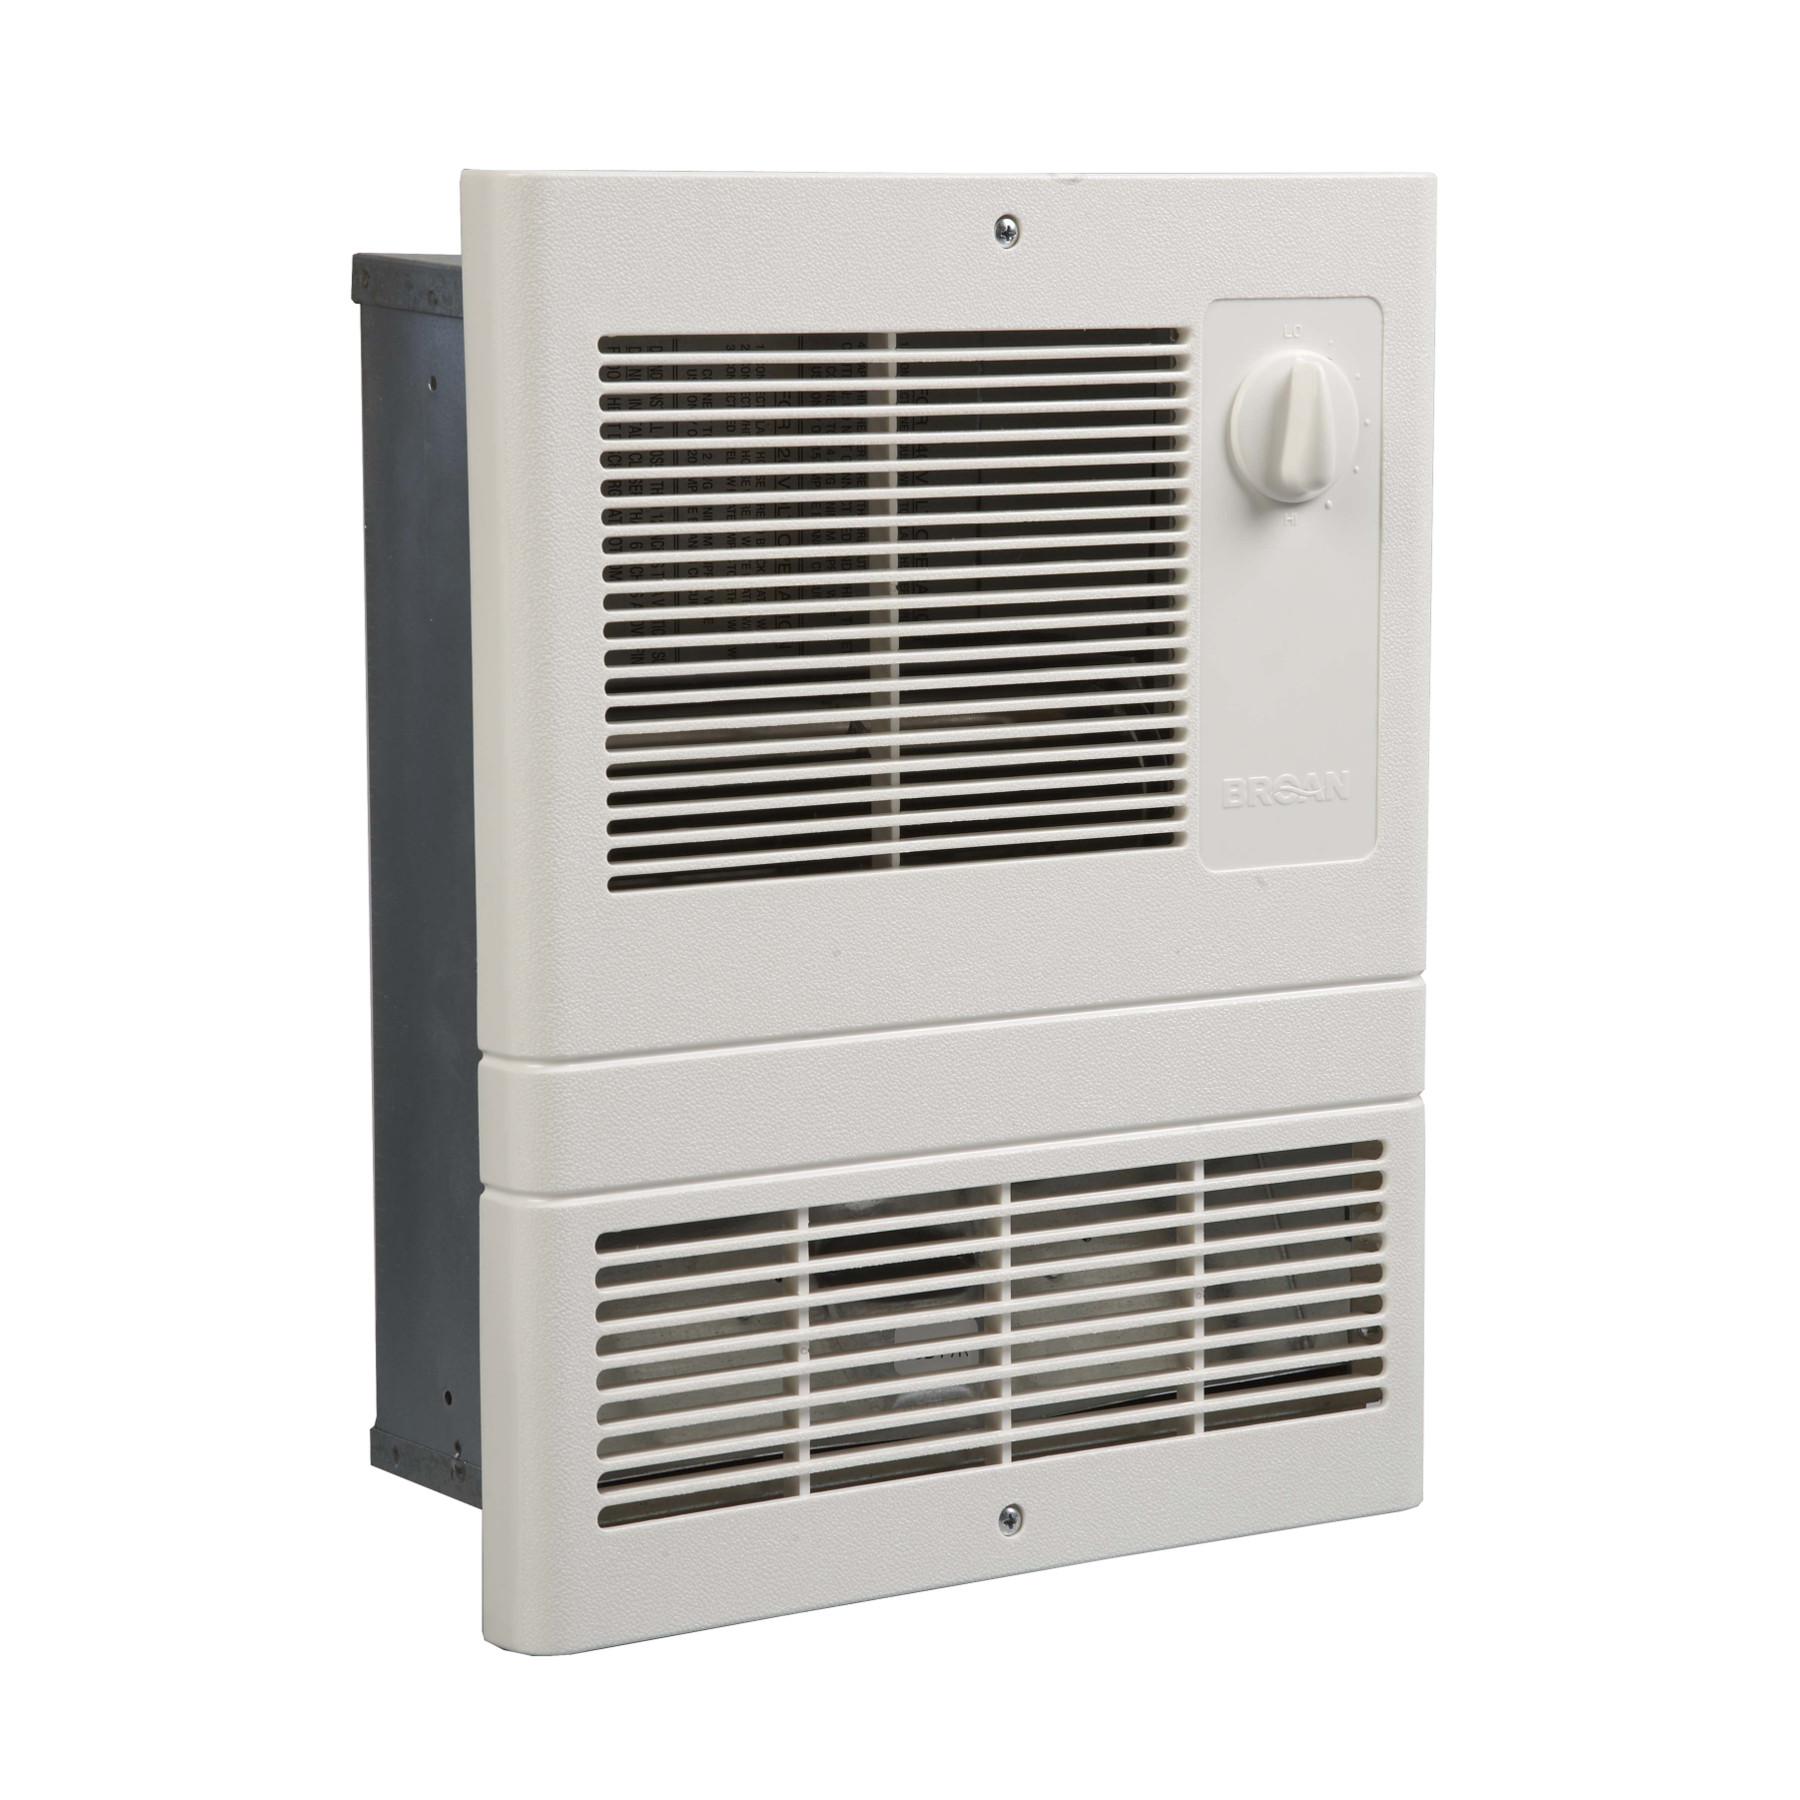 Broan Nutone Attic Fan Thermostat Control